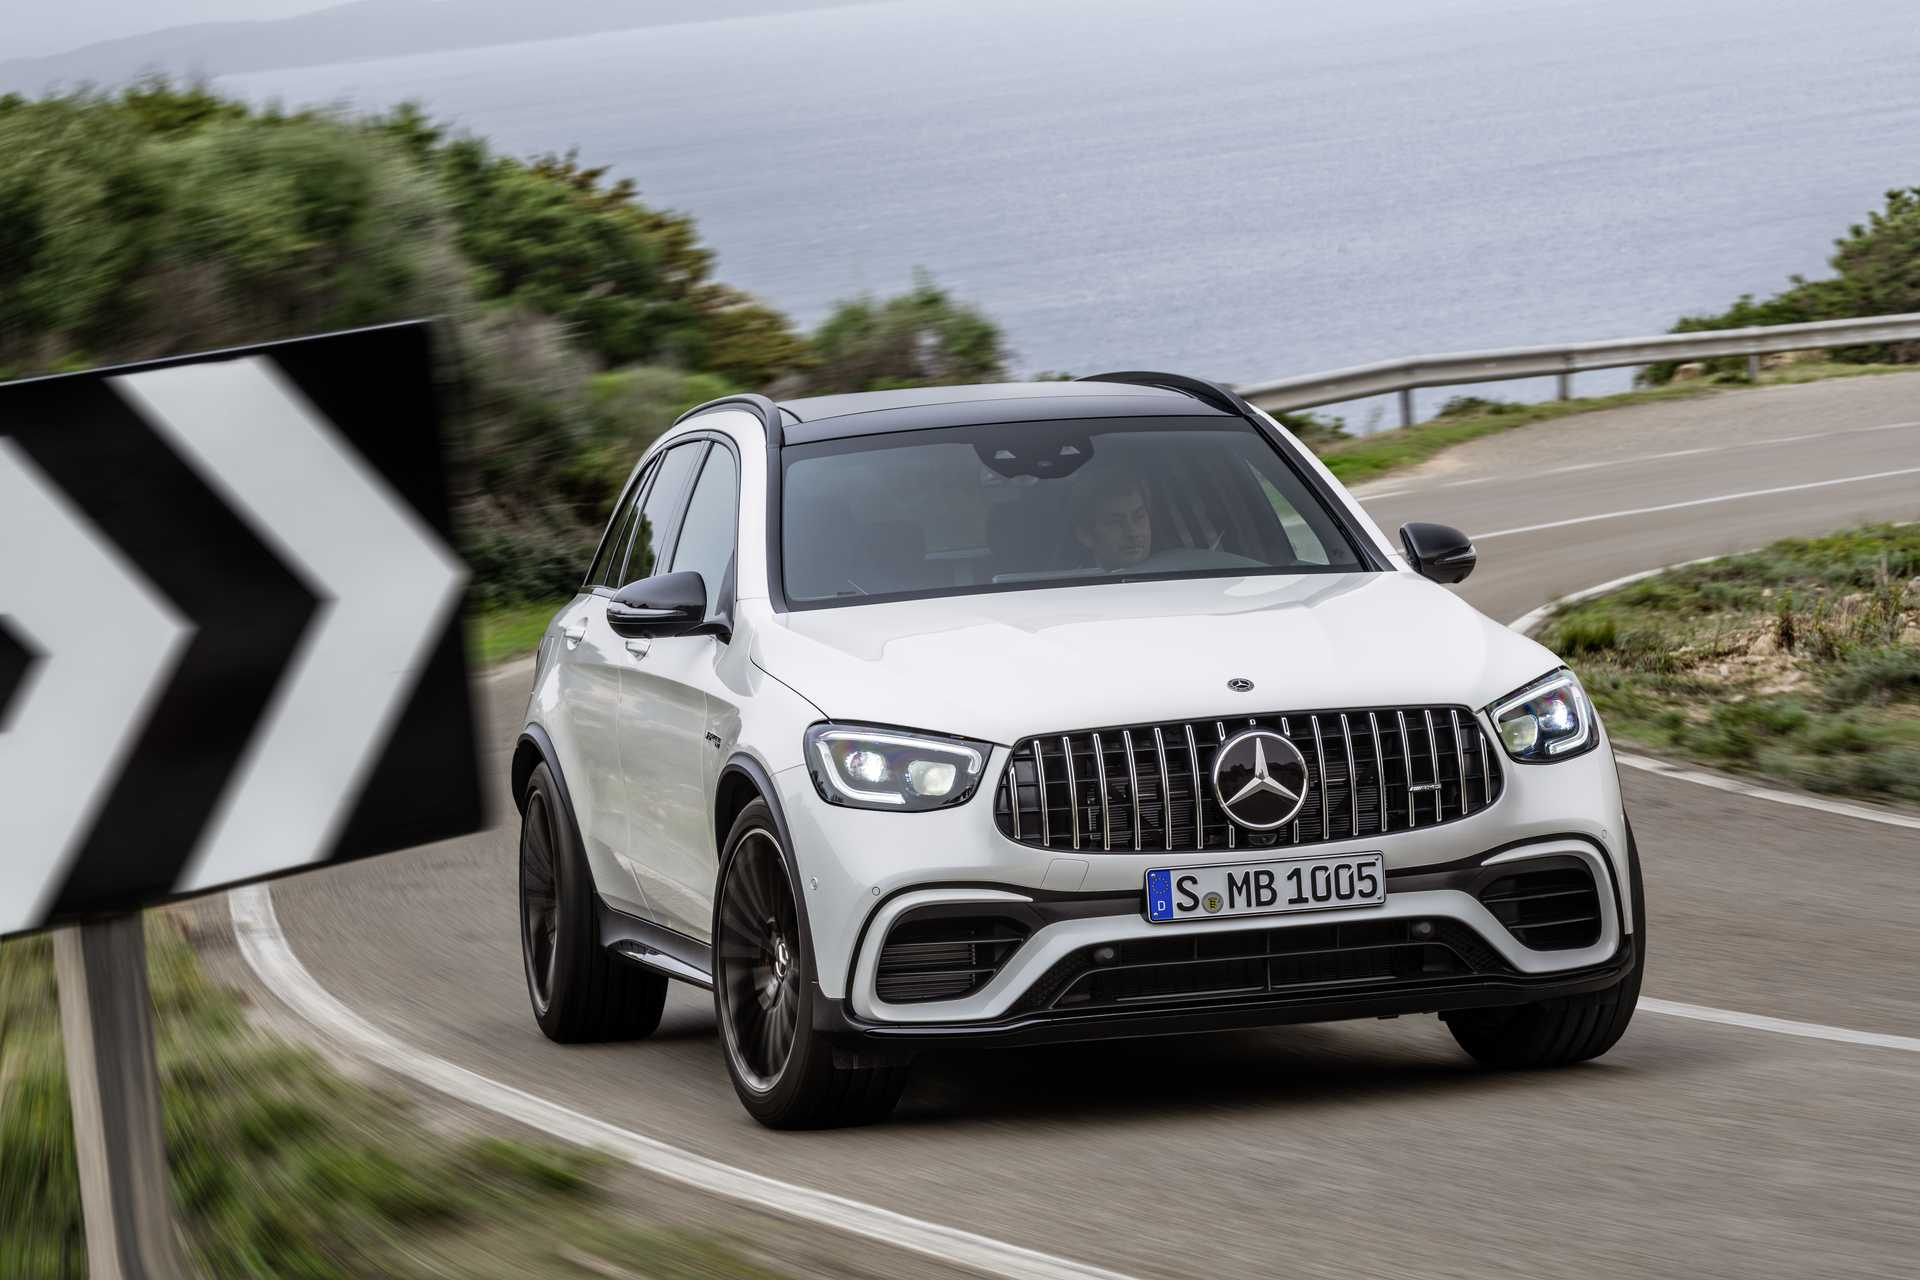 Mercedes-Benz AMG GLC 63 S 4MATIC+  , 510hp, 2019